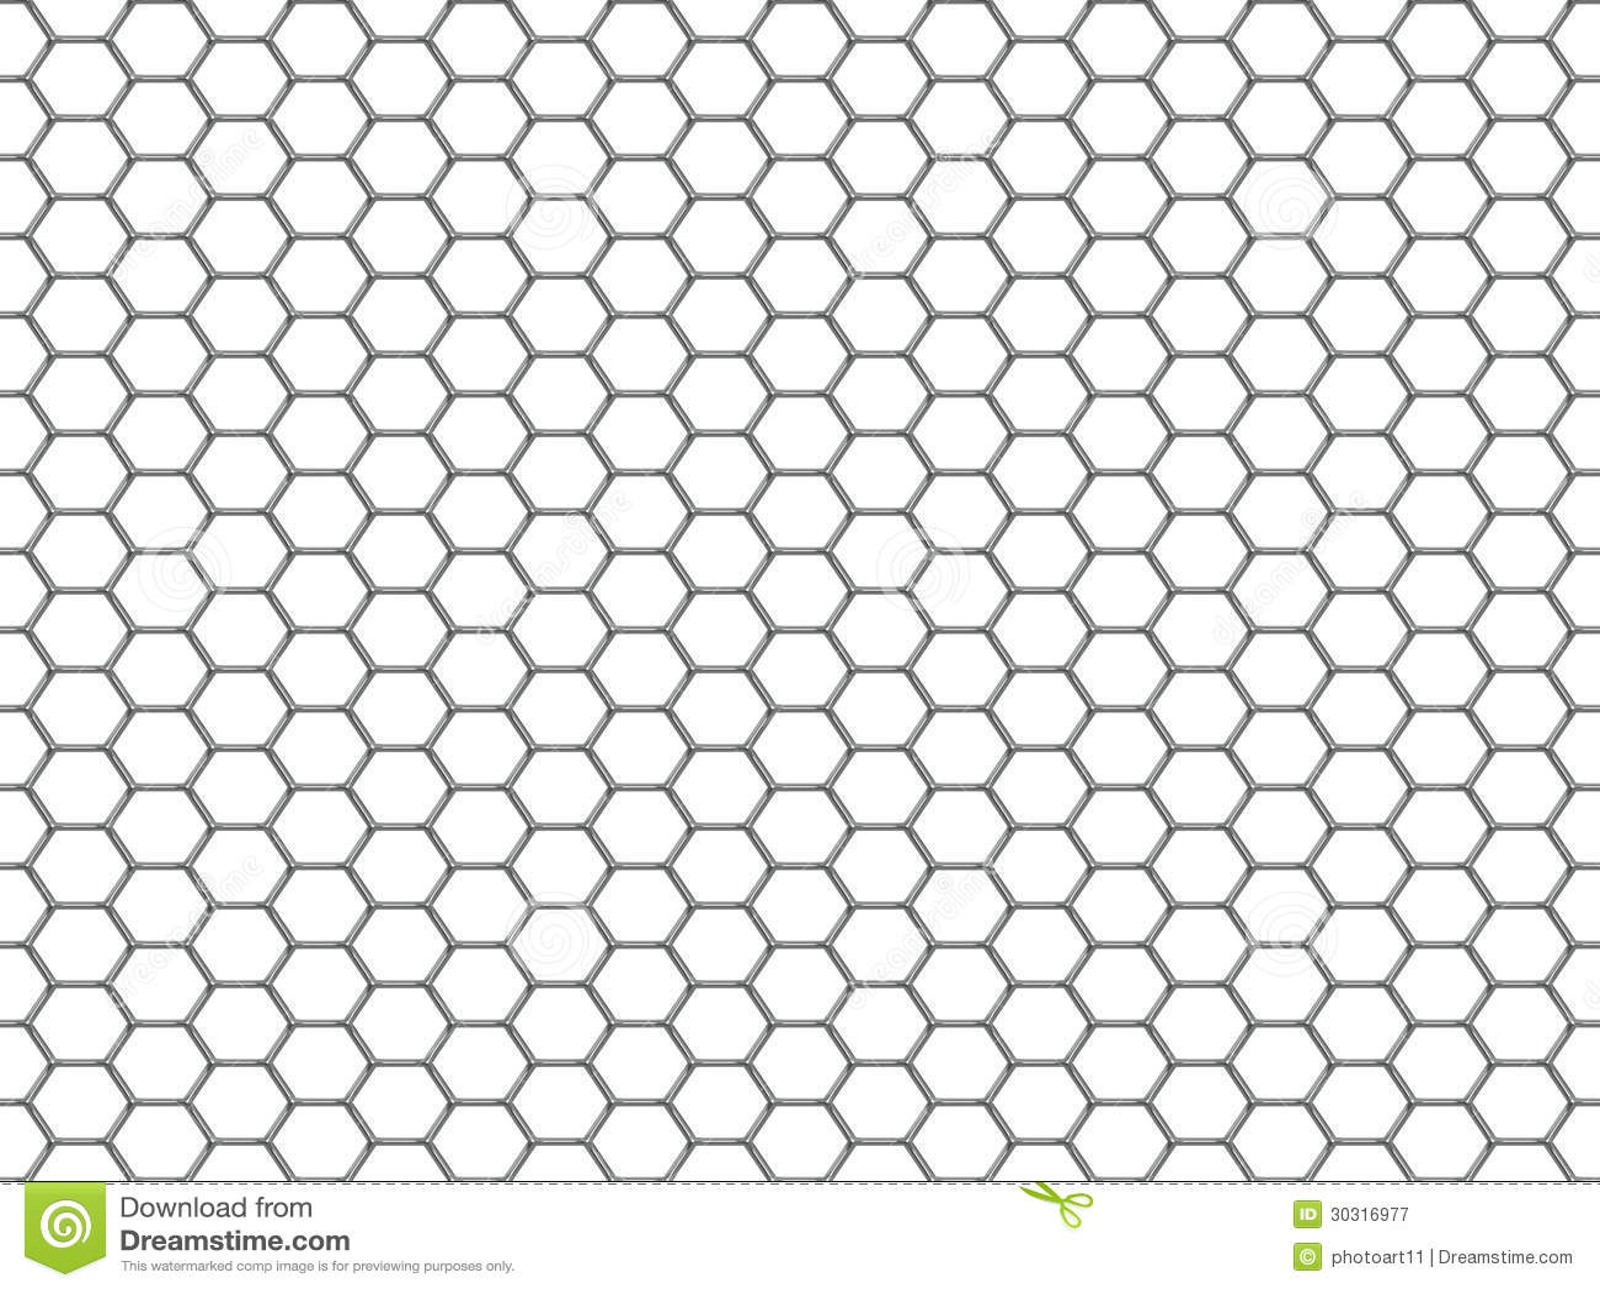 metal mesh stock illustration  image of steel  pattern